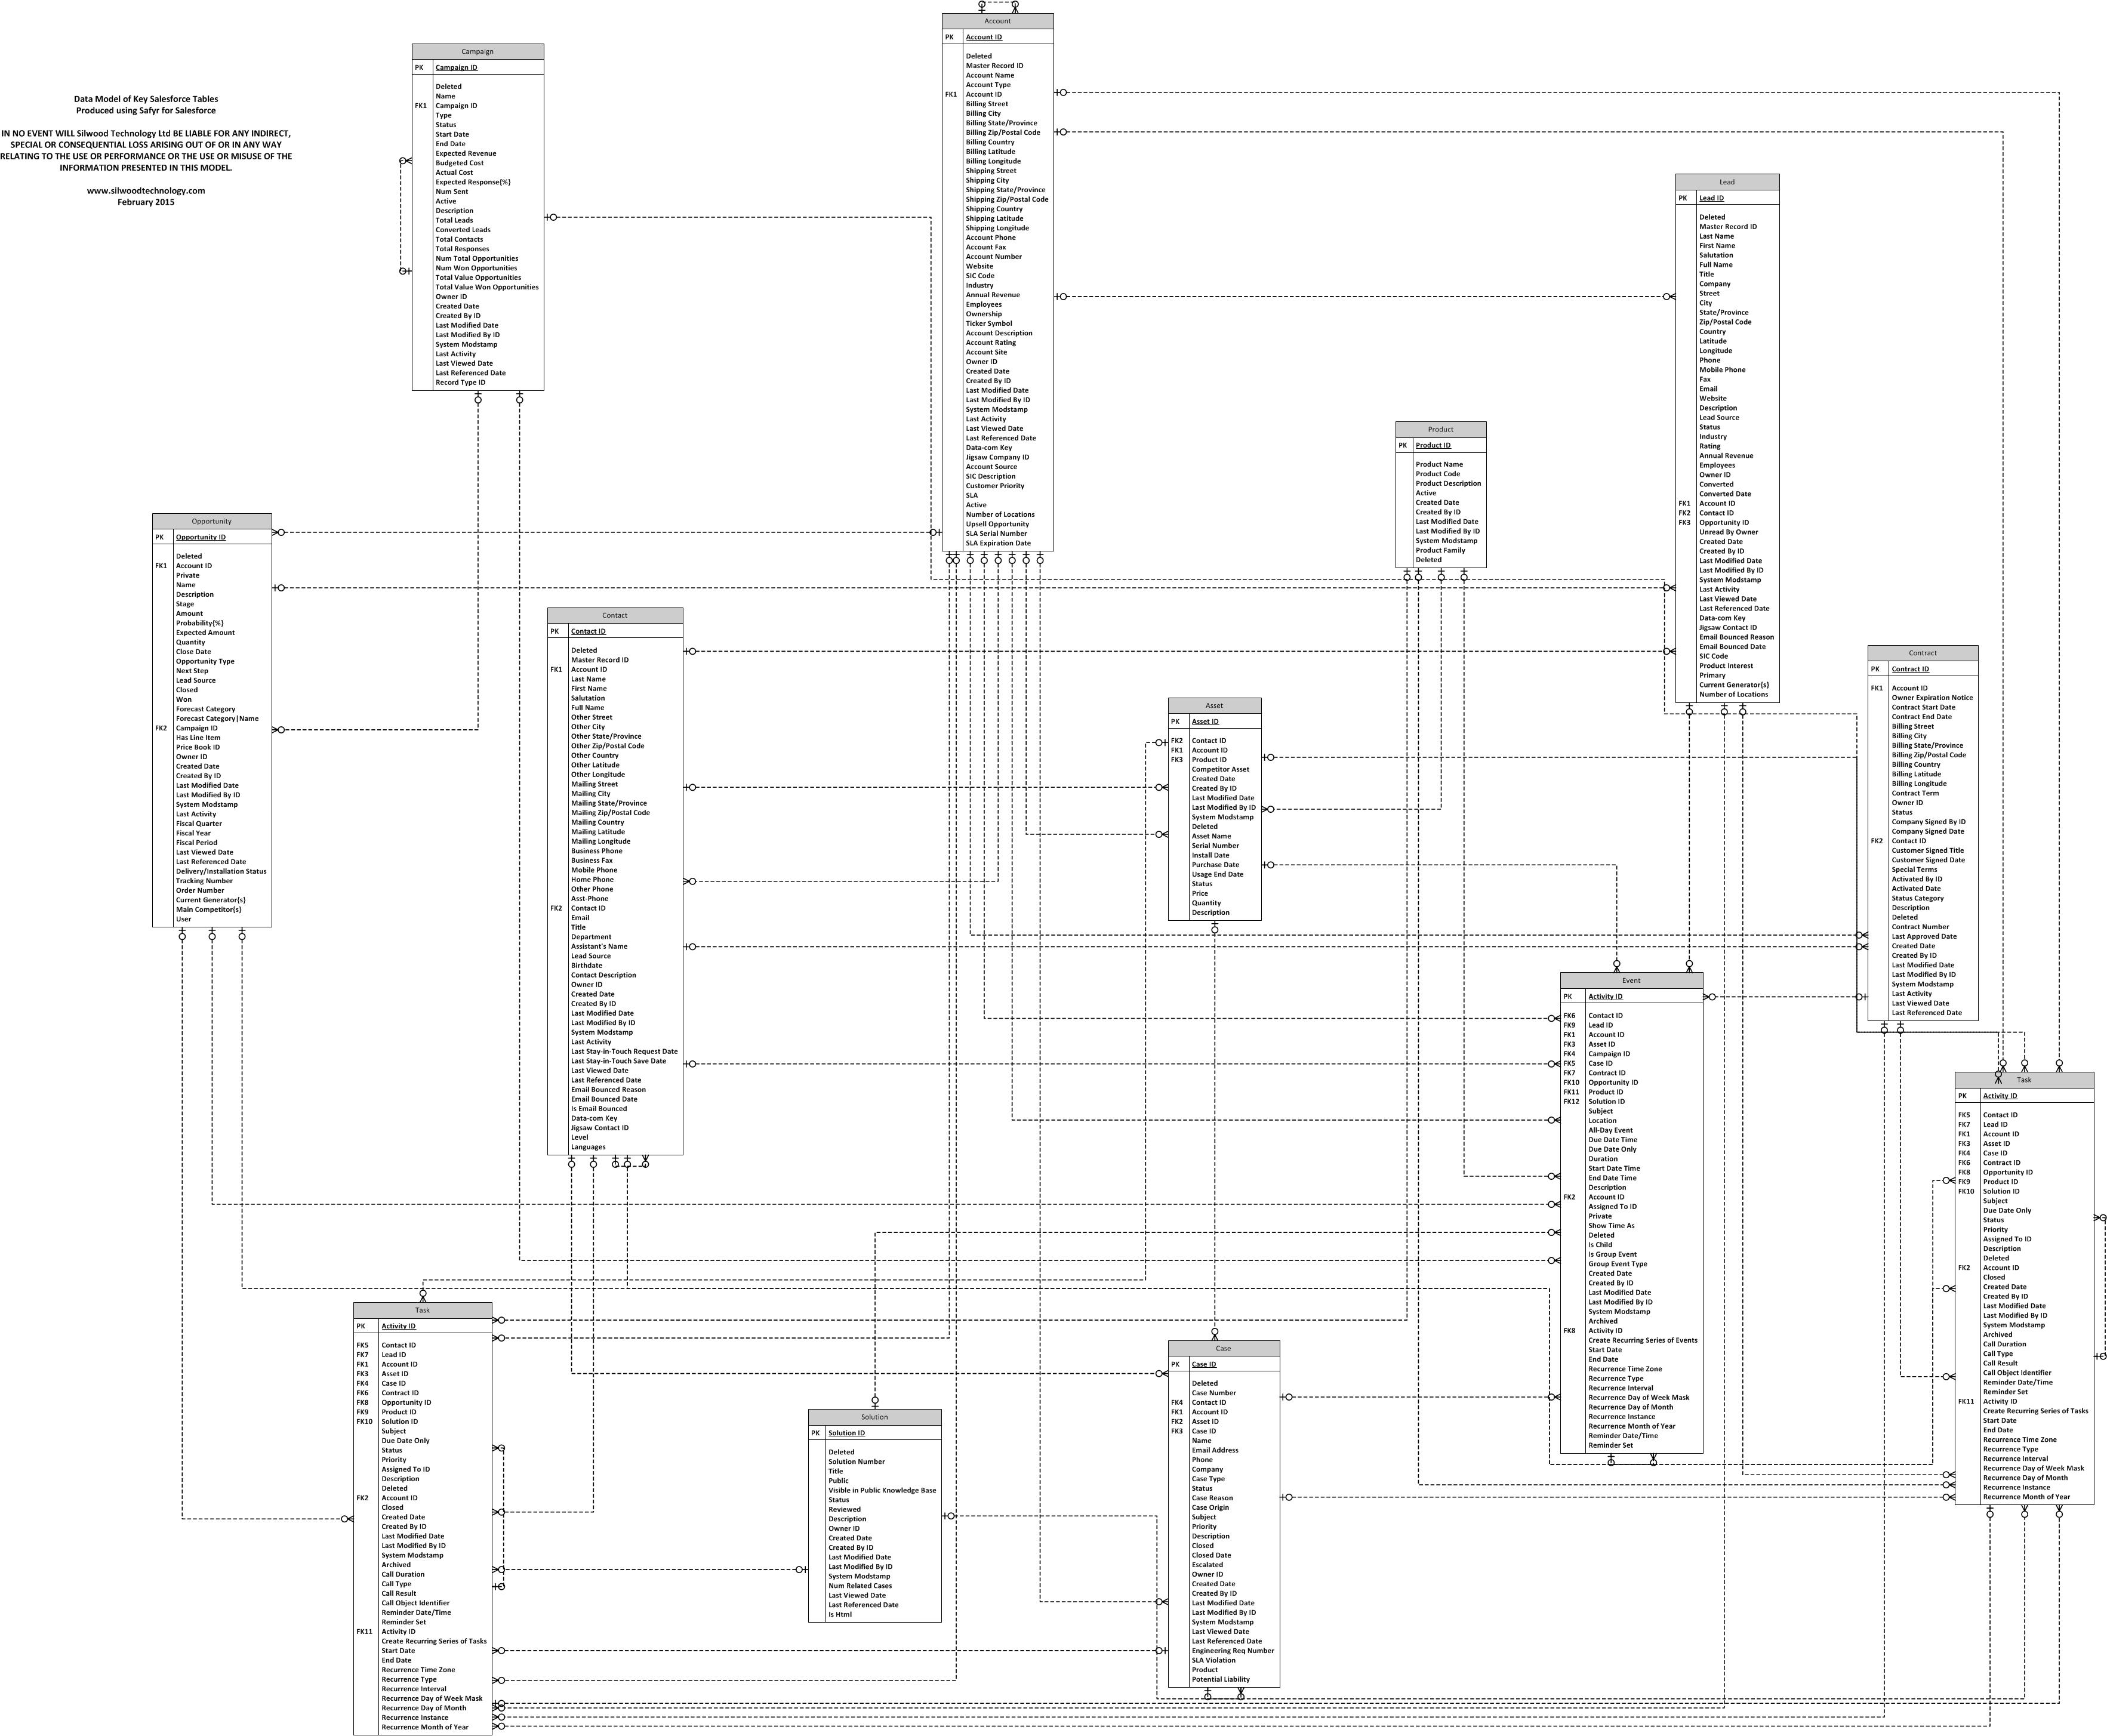 Guitar Wiring Diagram Visio Visio Block Diagram Wiring